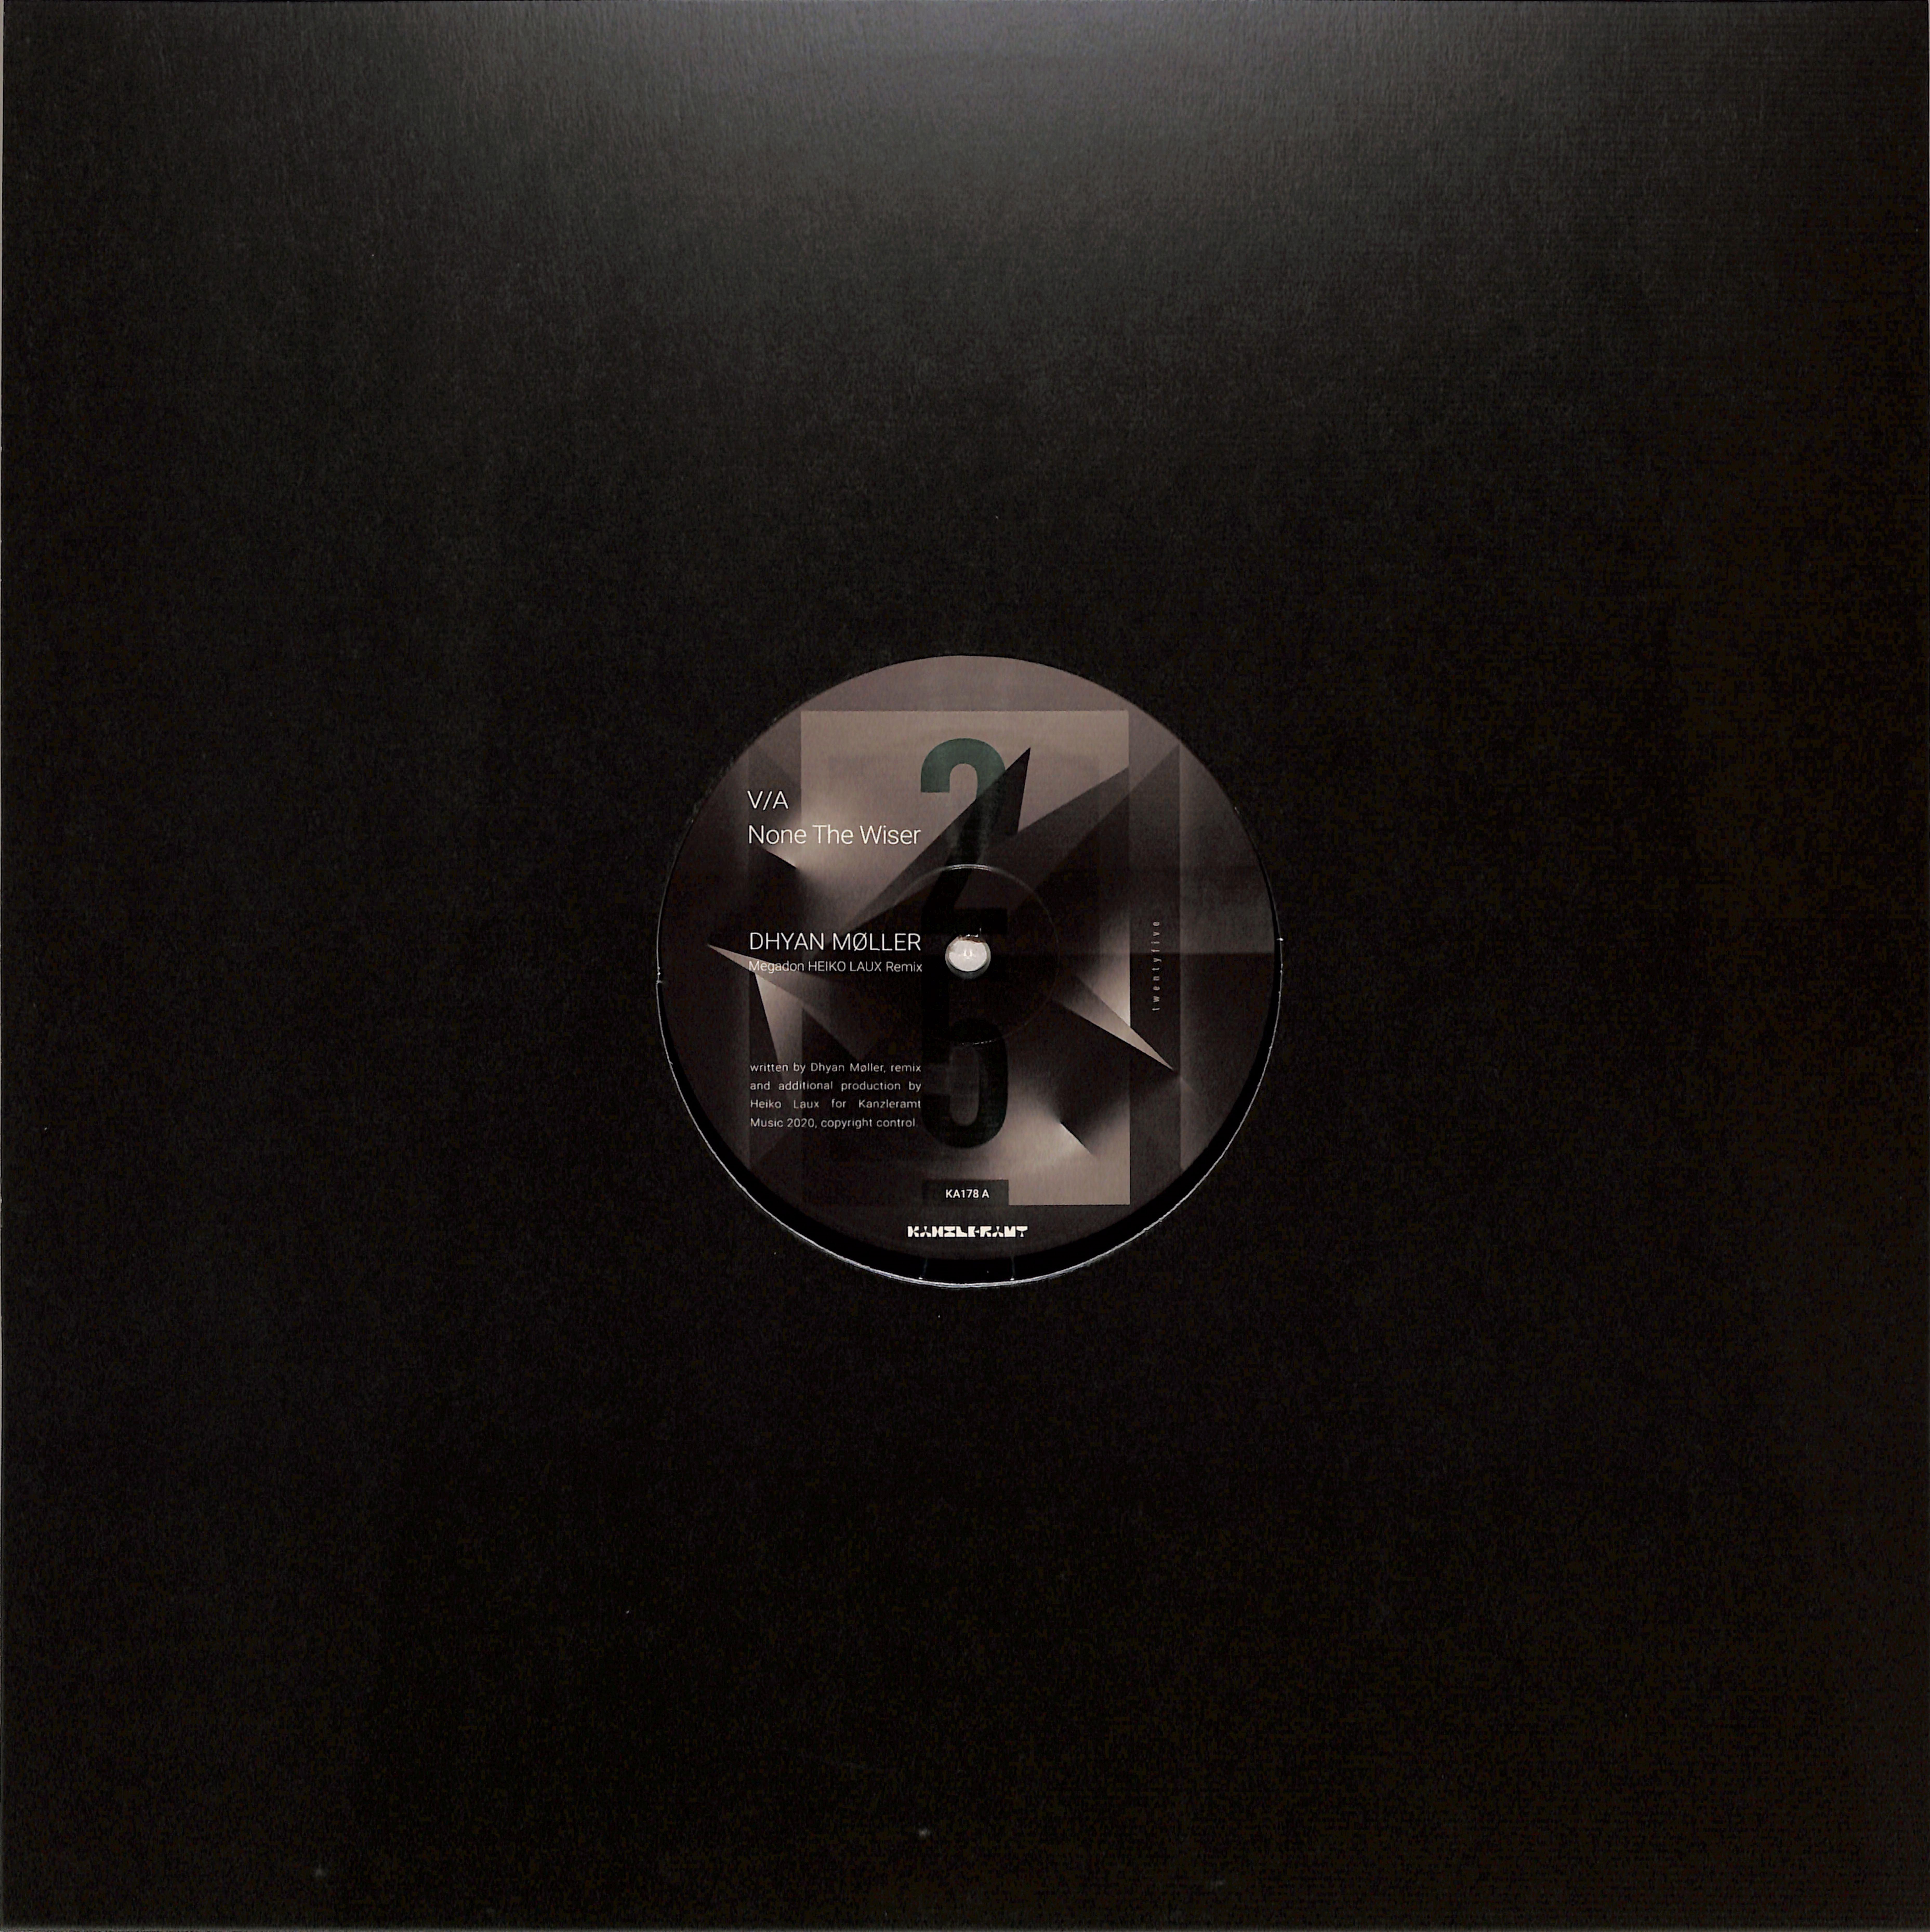 Dhyan Moller / Joel Mull / Heiko Laux / Ray Kajioka - NONE THE WISER